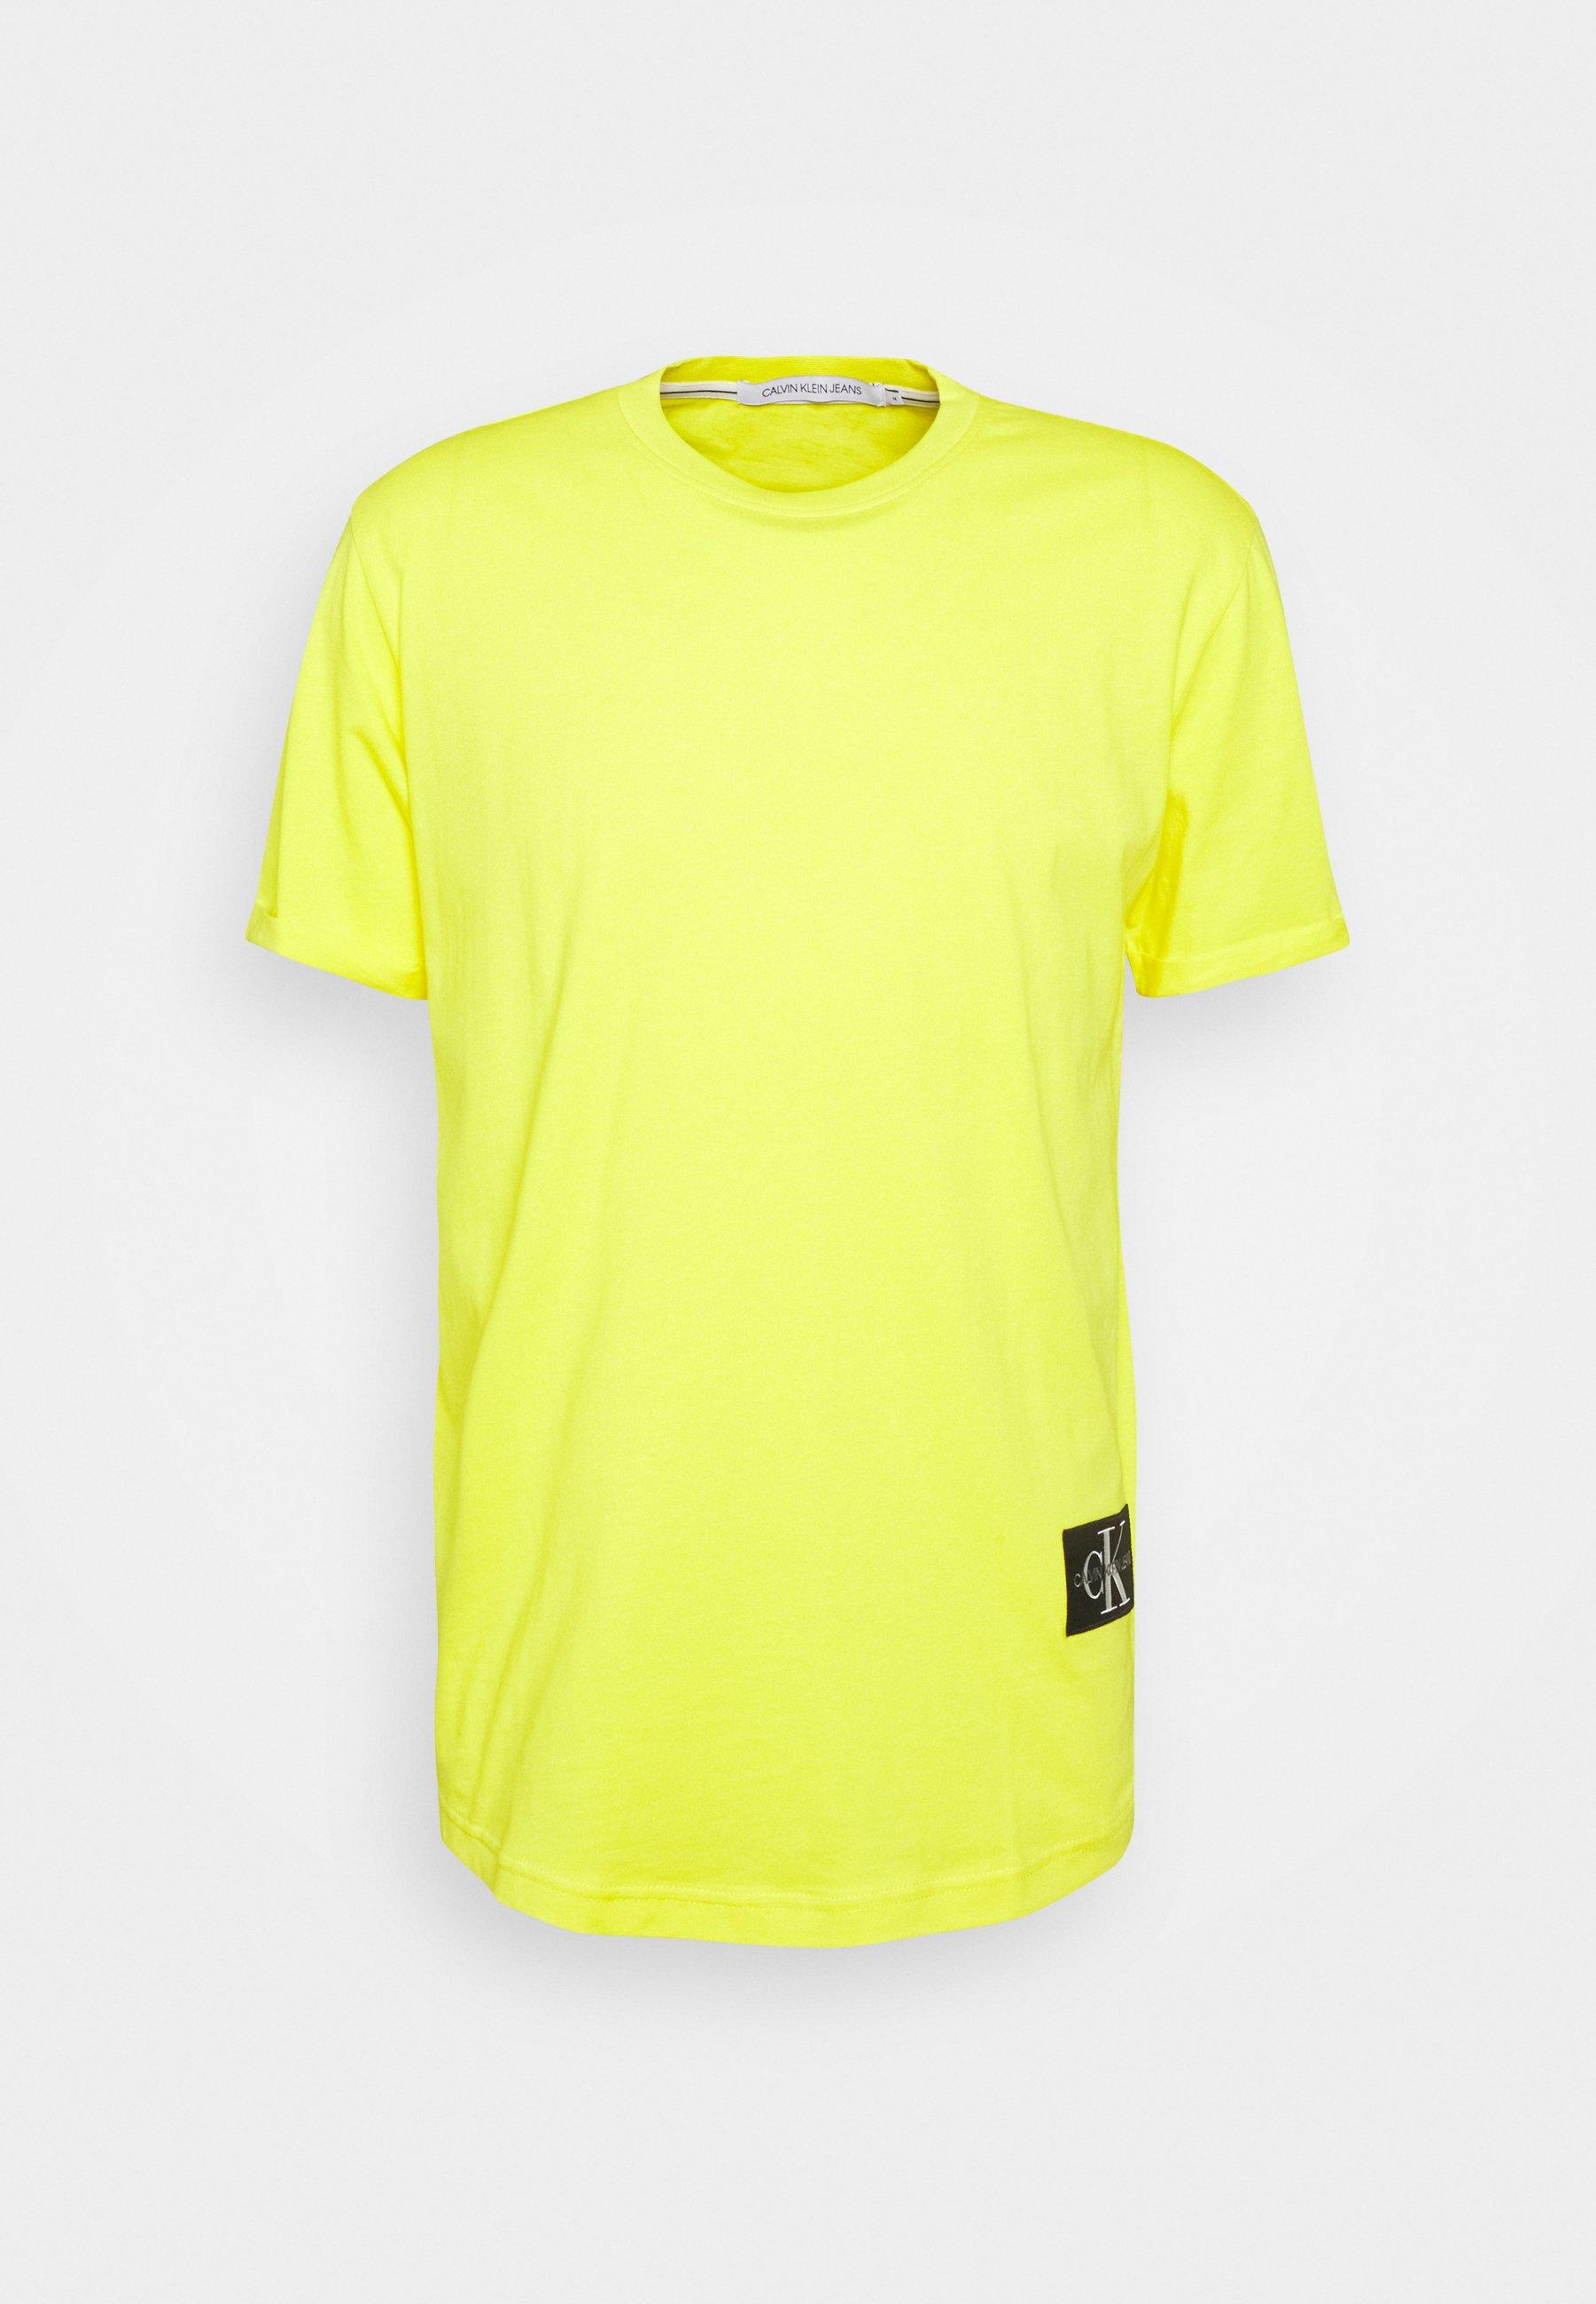 Homme BADGE TURN UP SLEEVE - T-shirt basique